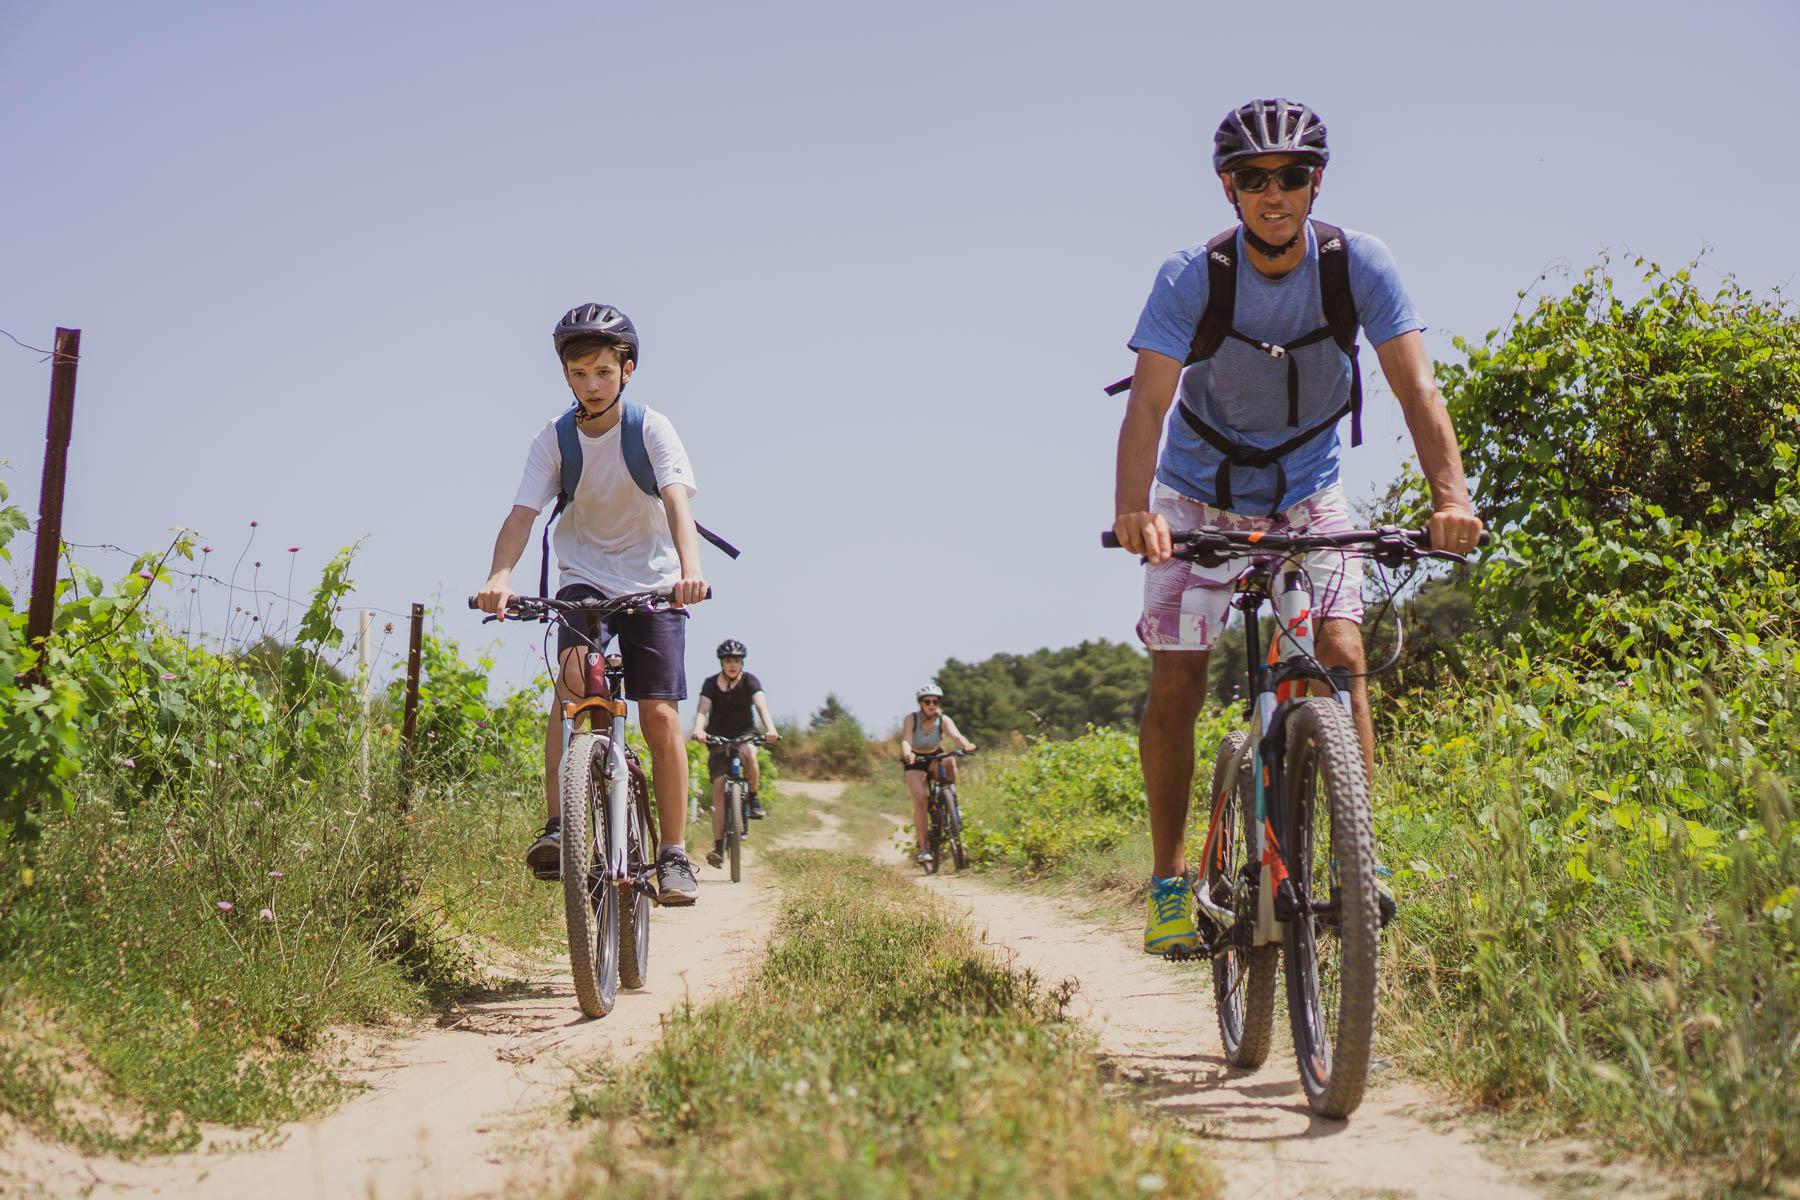 Biking through the Vineyards on Vis Island, Croatia